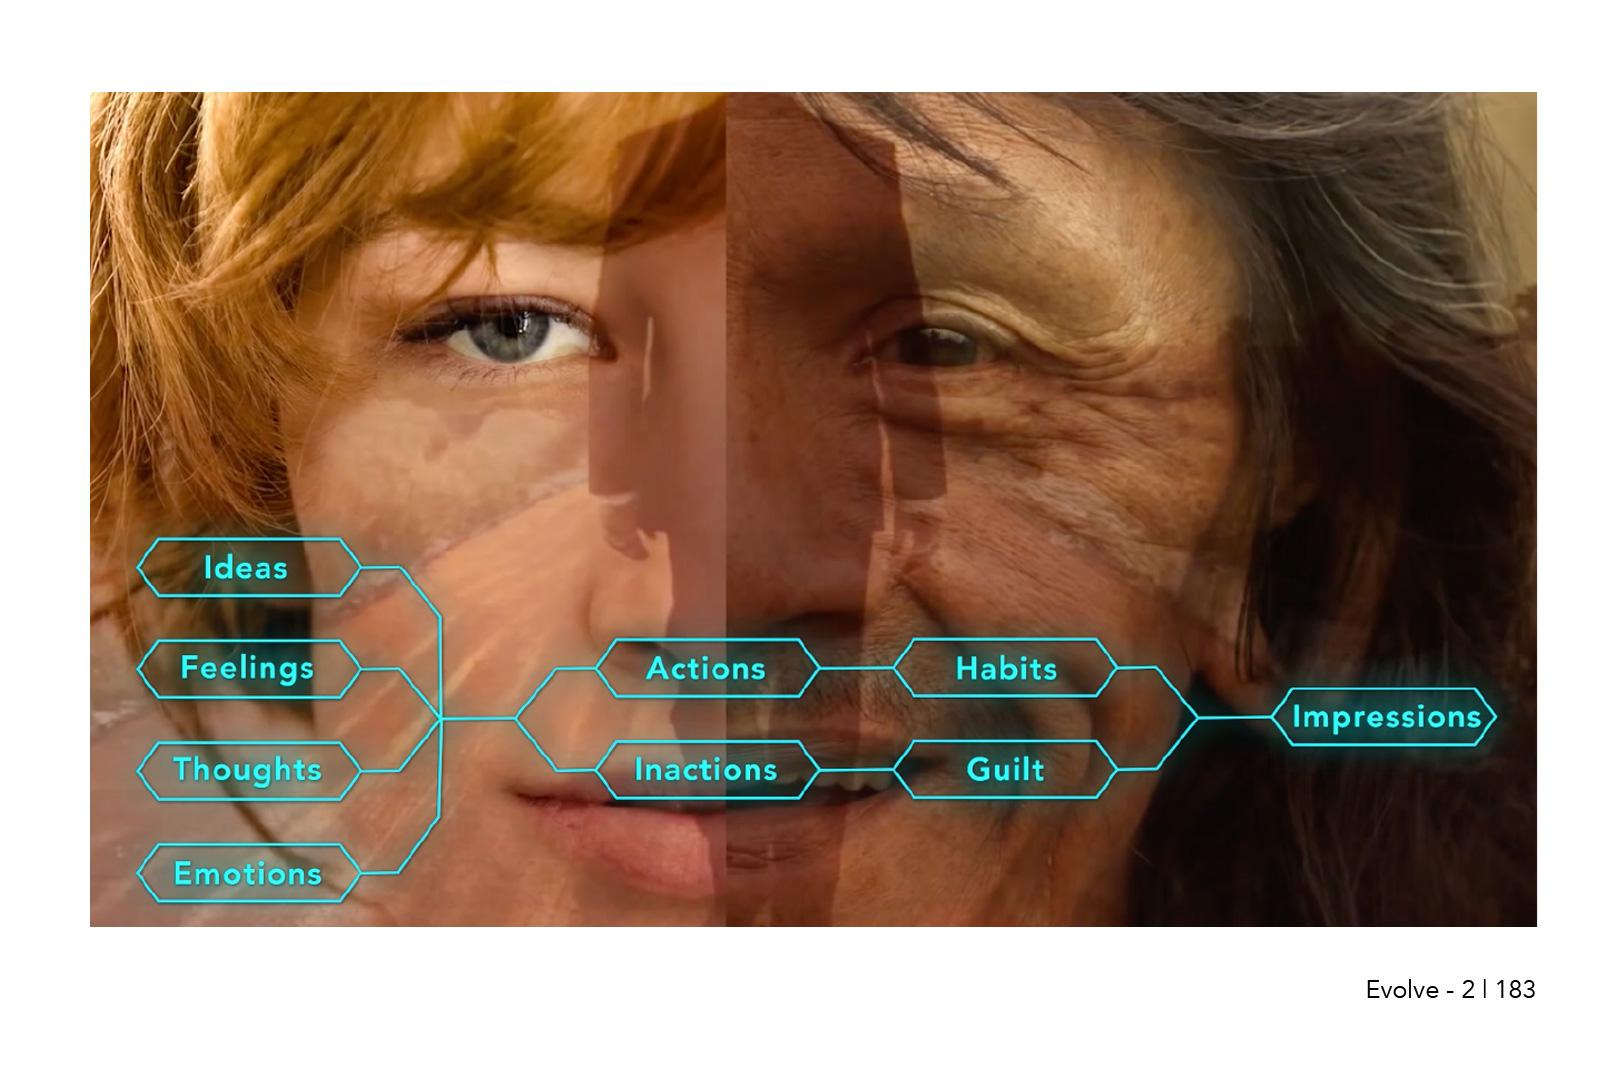 HUMAN<br>MATRIX Gallery Image